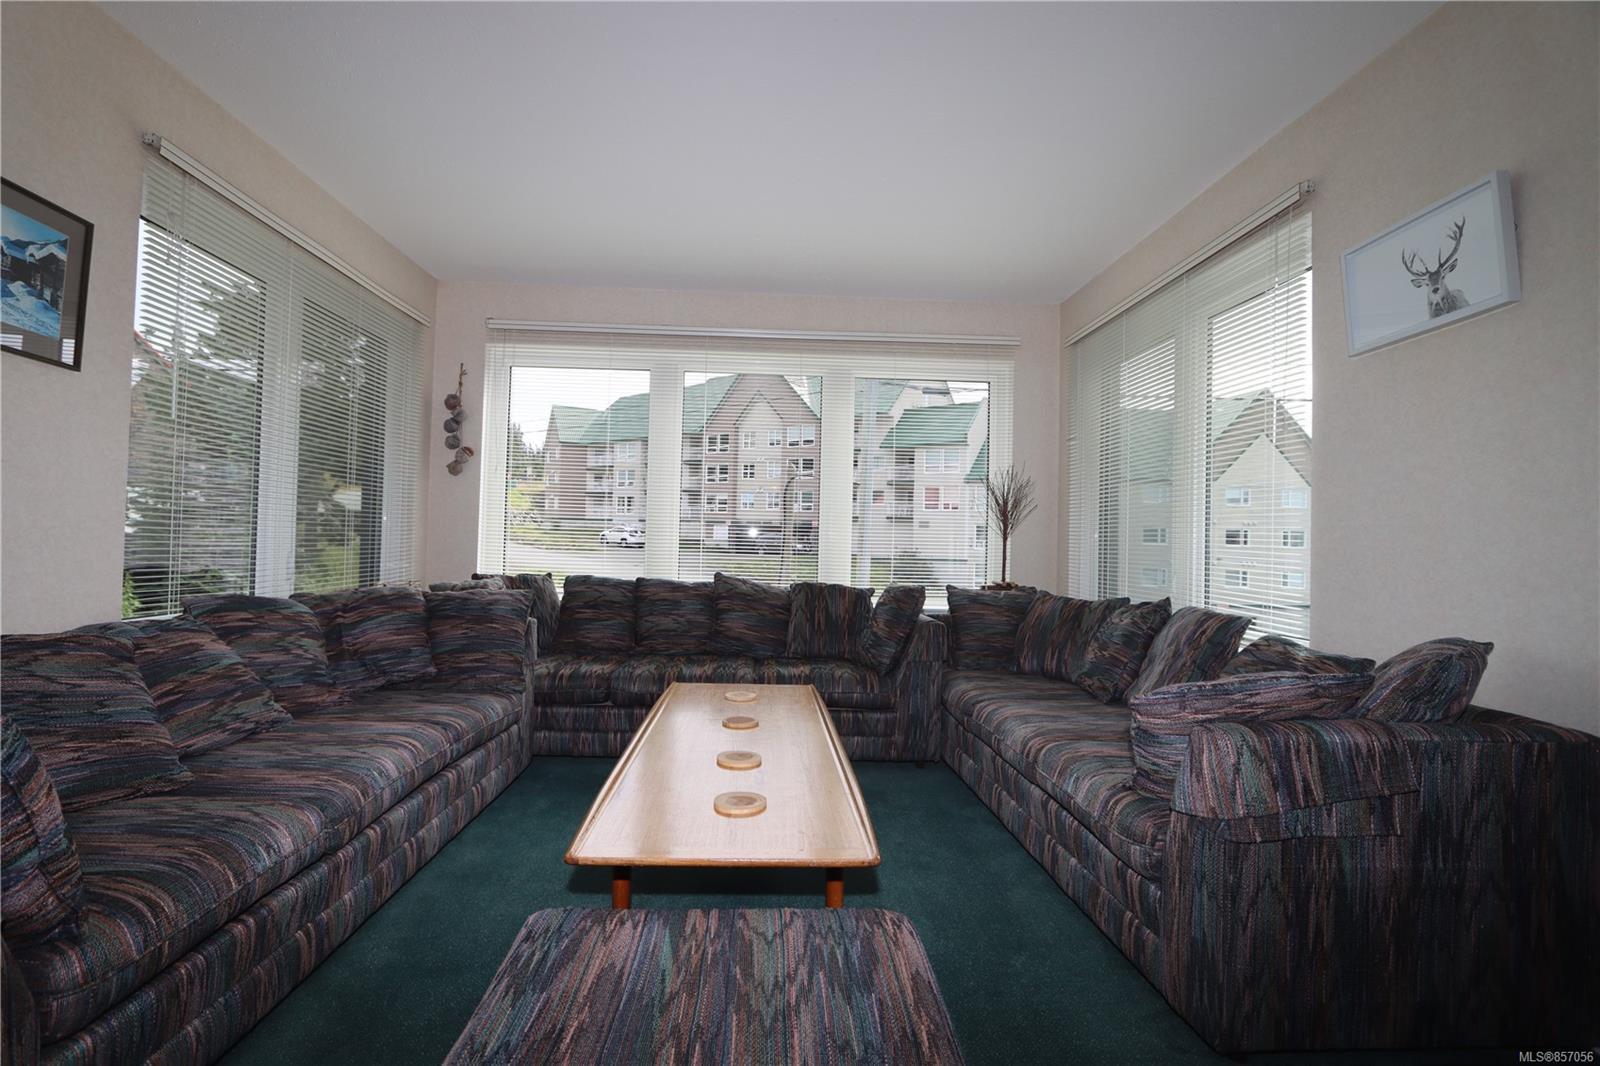 Photo 17: Photos: 118 1320 Henry Rd in : CV Mt Washington Condo for sale (Comox Valley)  : MLS®# 857056